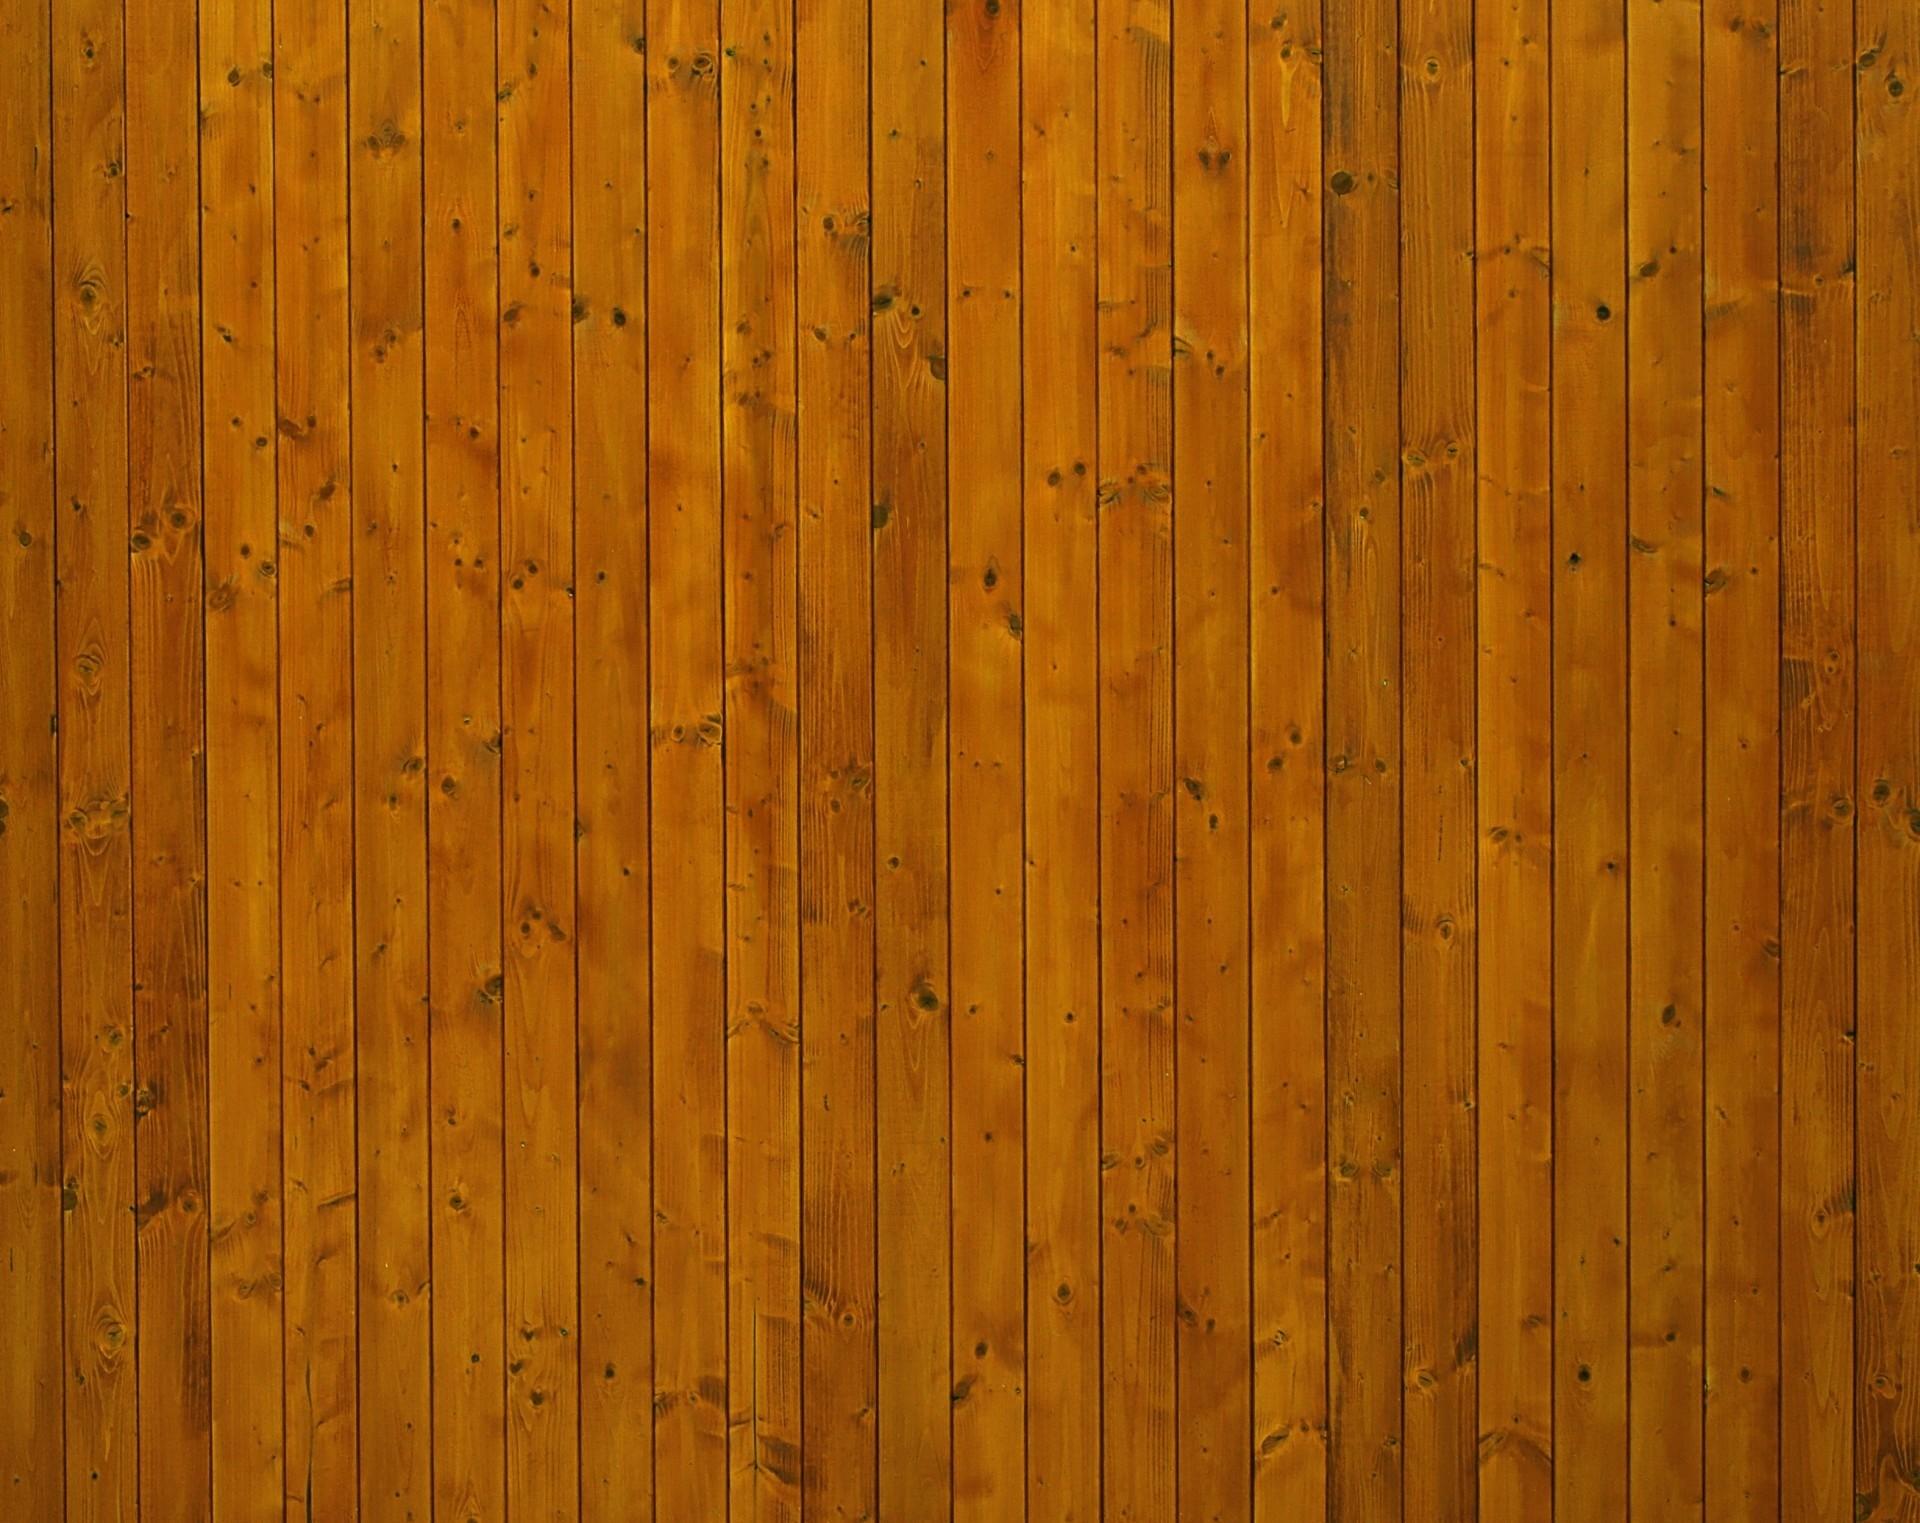 … lumber, door, surface, background, hardwood, wooden, wallpaper,  backboard, wood flooring, man made object, laminate flooring, wood stain,  floor area, …